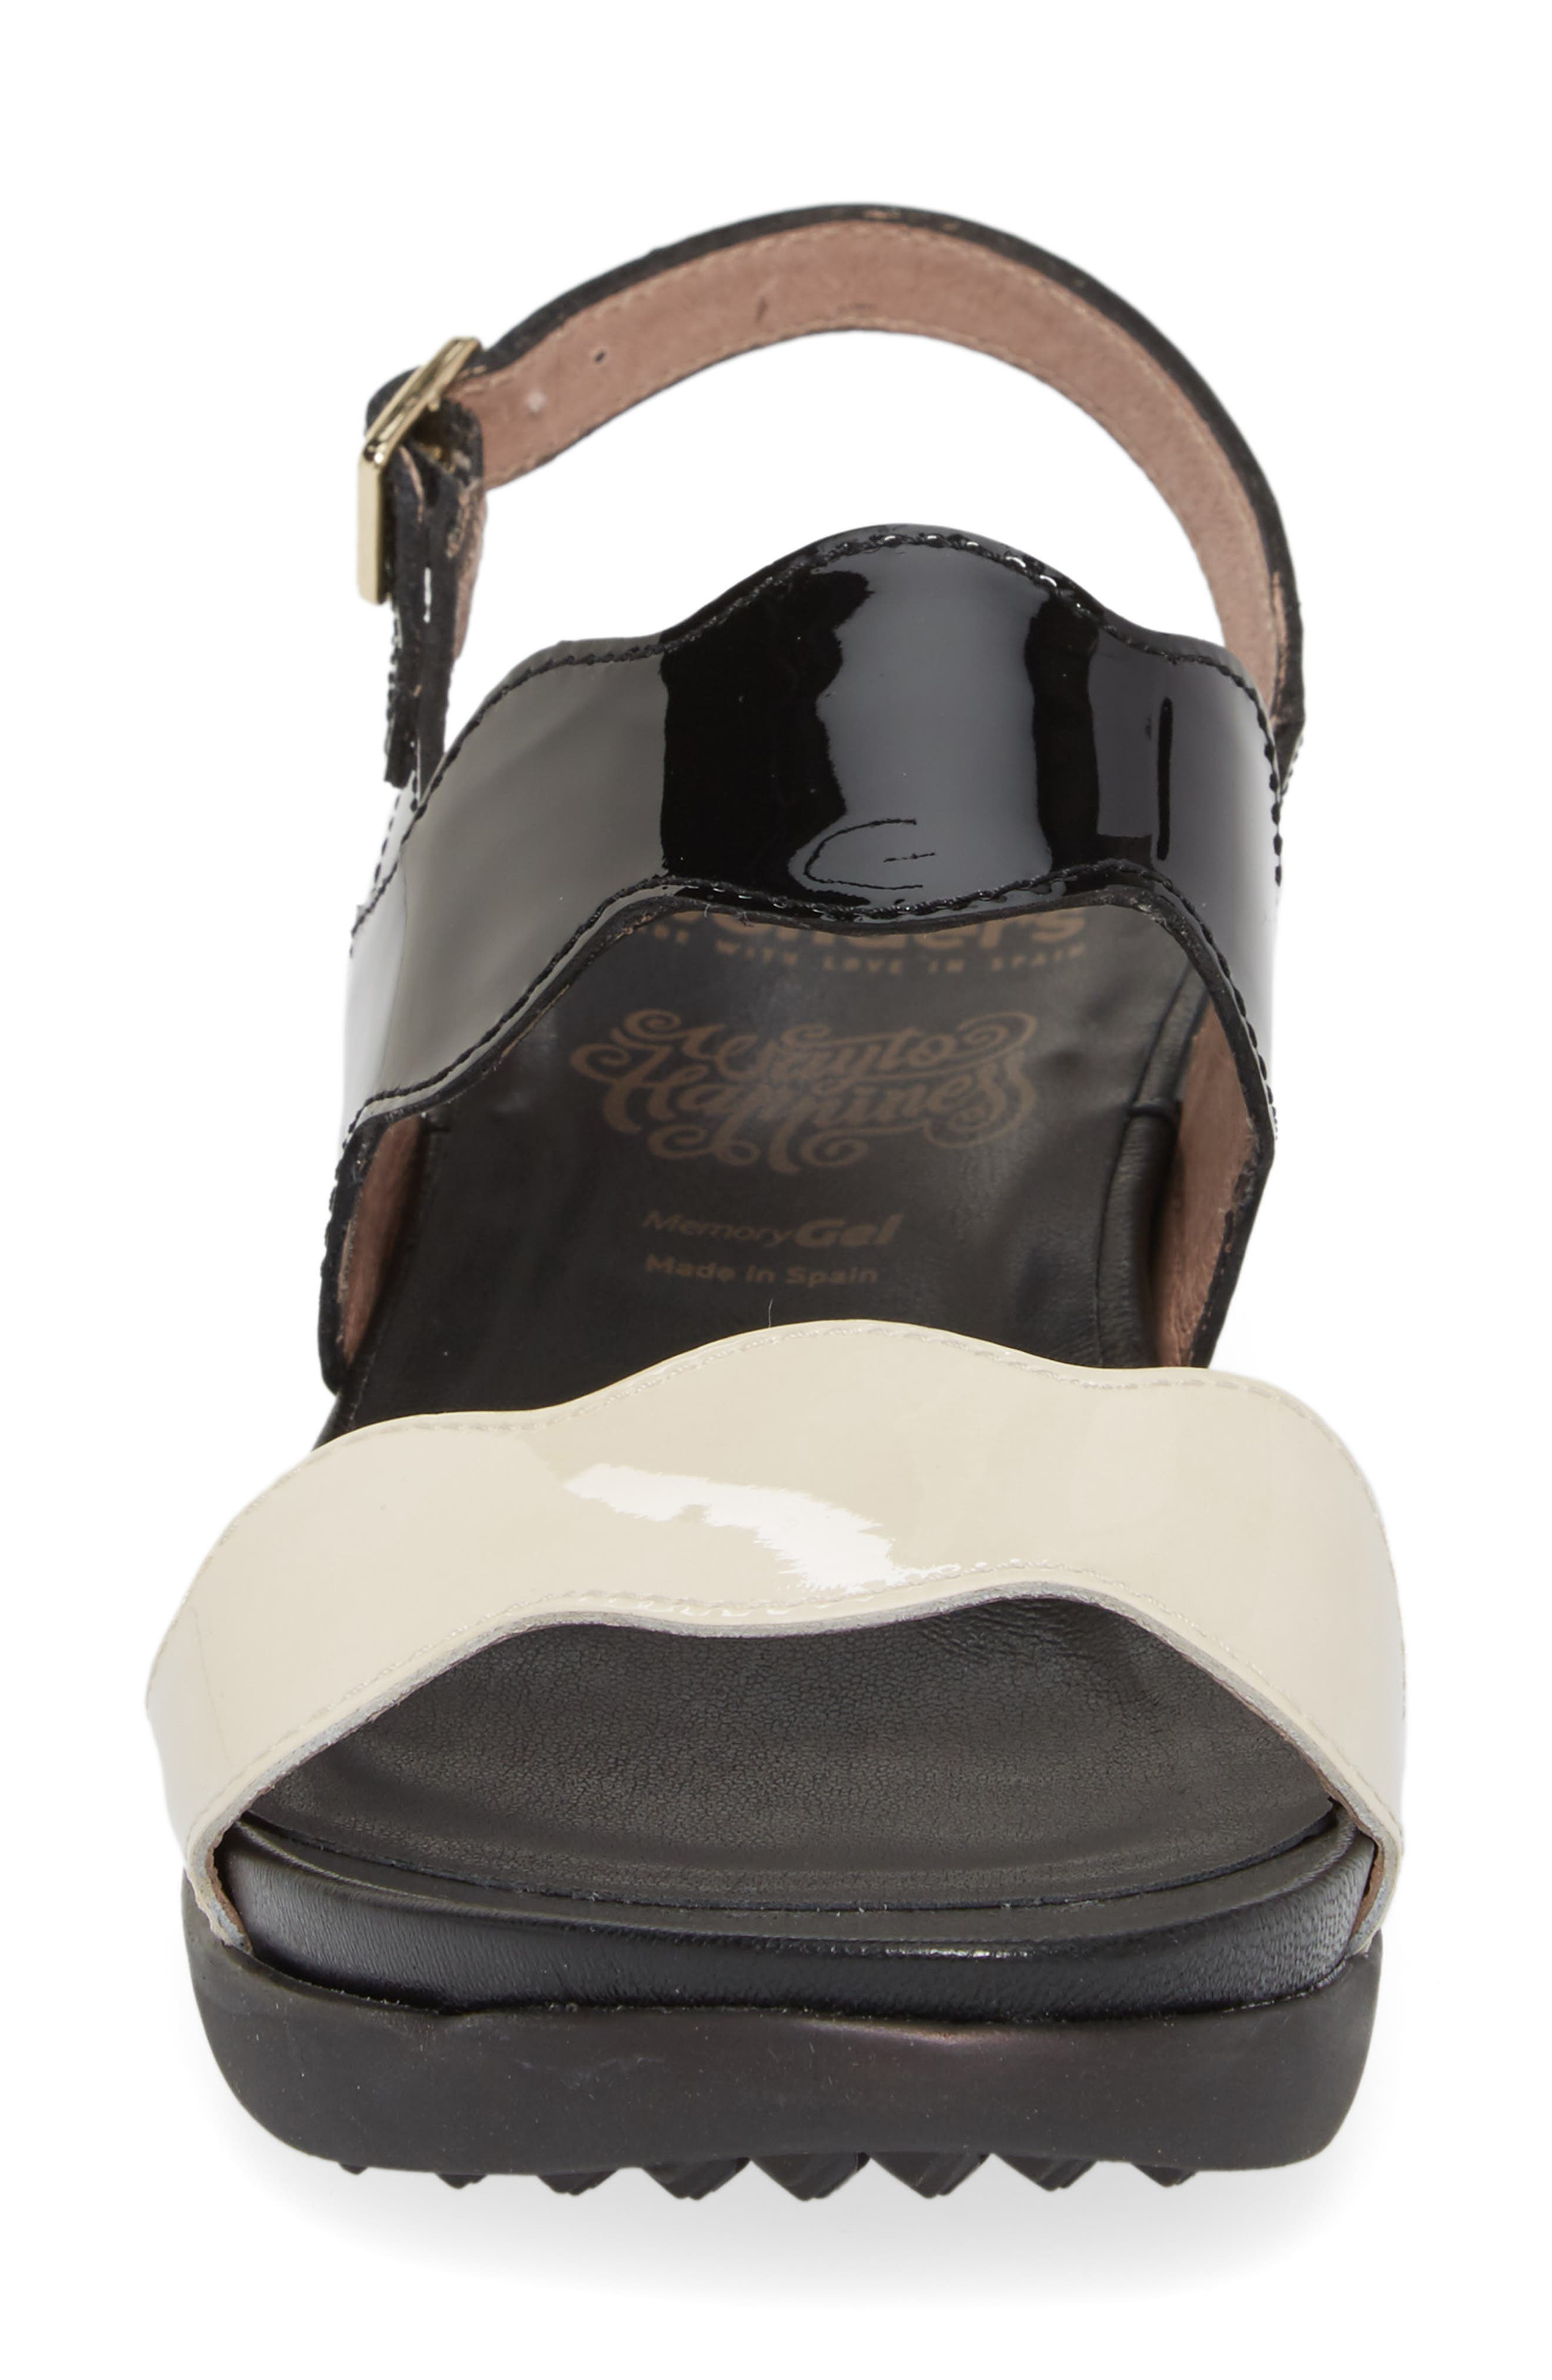 Wedge Sandal,                             Alternate thumbnail 4, color,                             BLACK/ OFF LEATHER